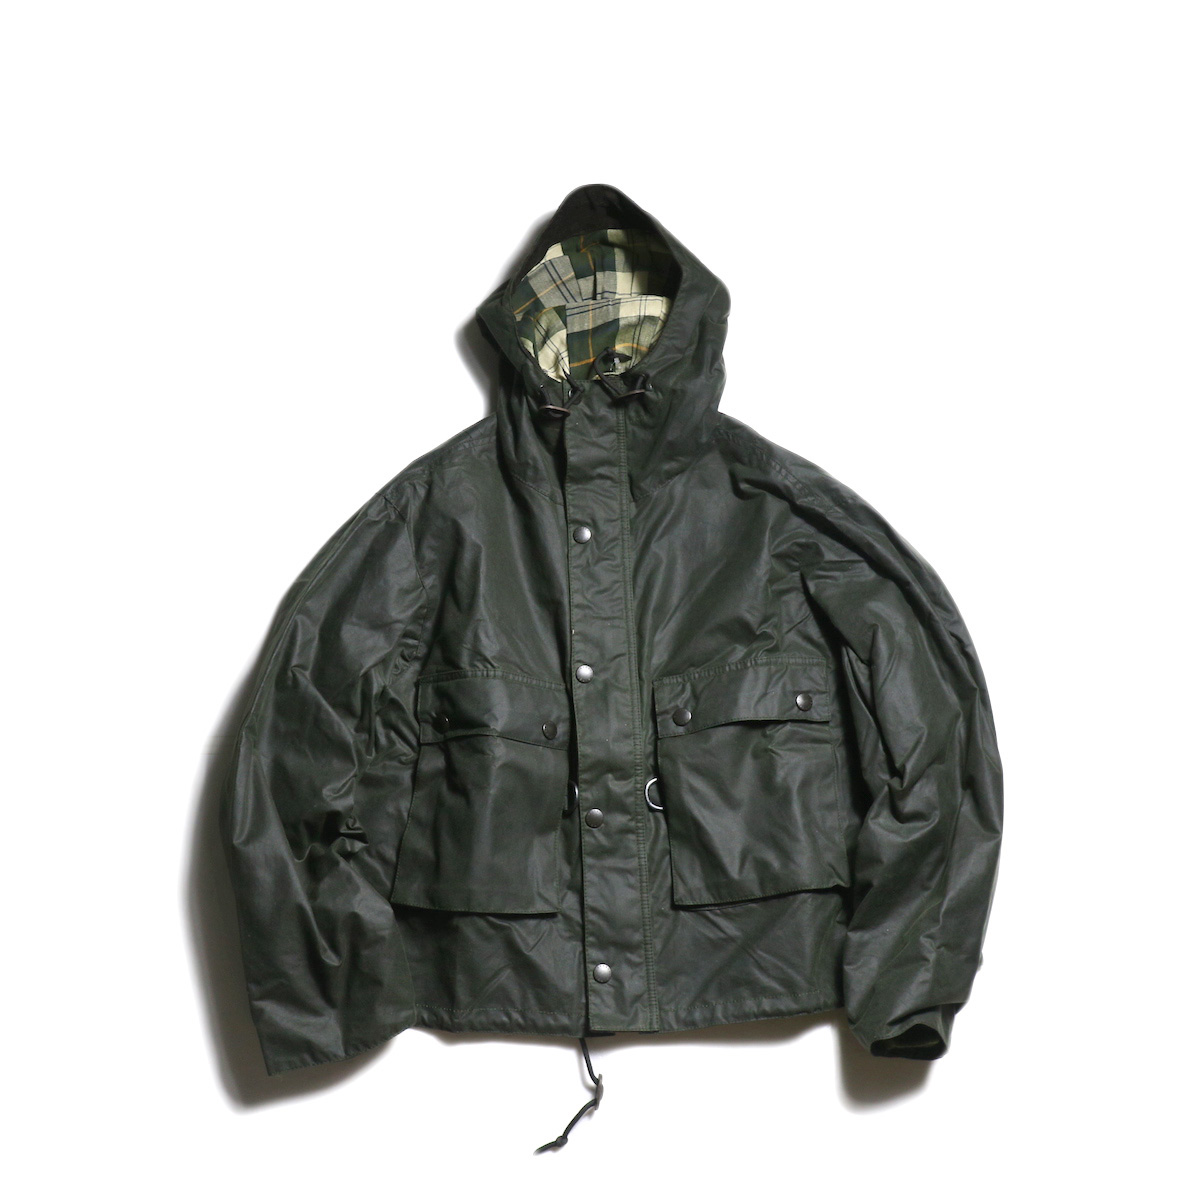 Kaptain Sunshine × Barbour / Field Short Hoody jacket (Sage Green)